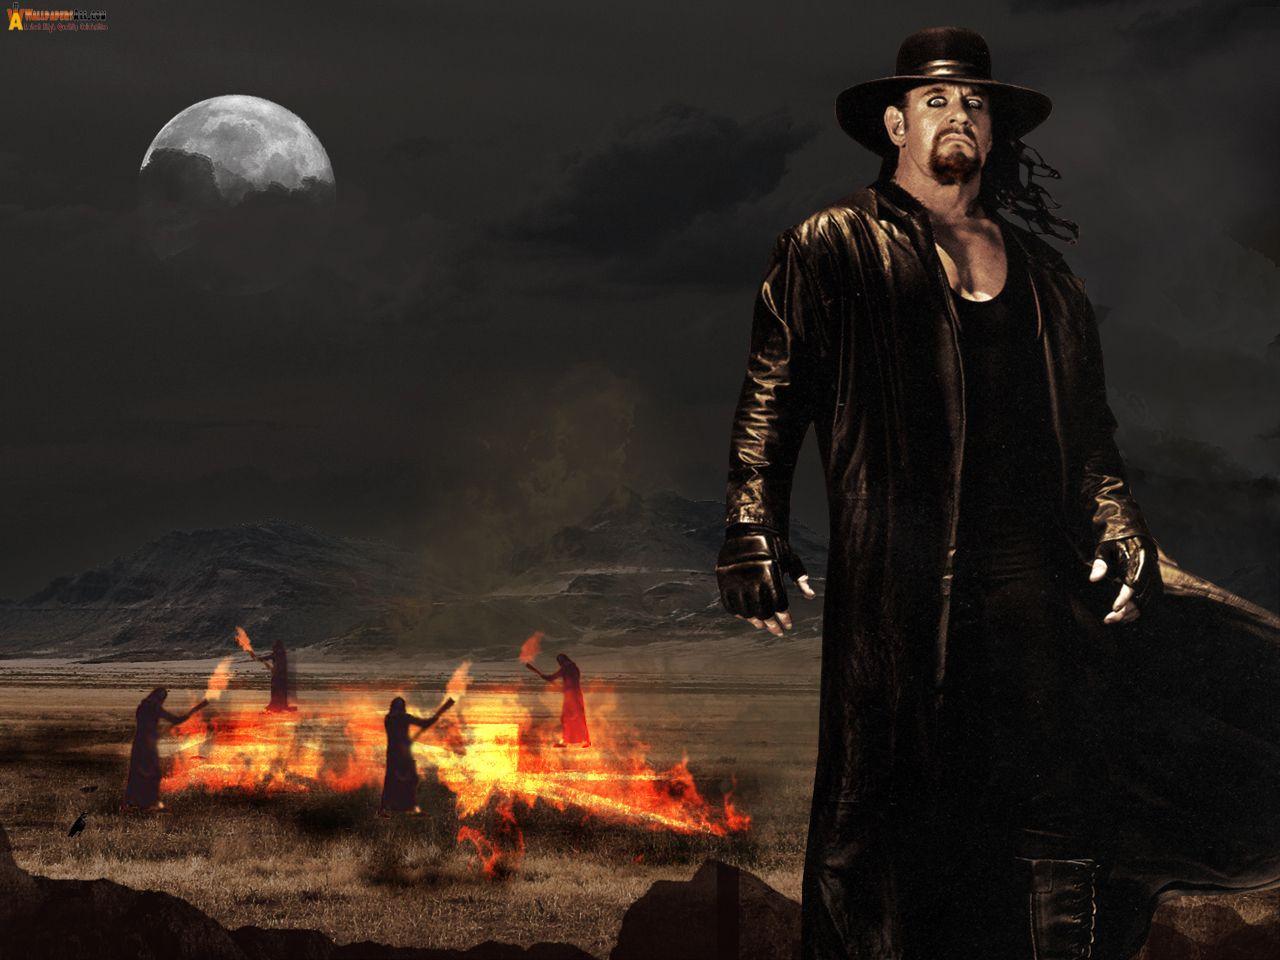 Undertaker Wallpaper 2012  Undertaker Wallpaper 2012